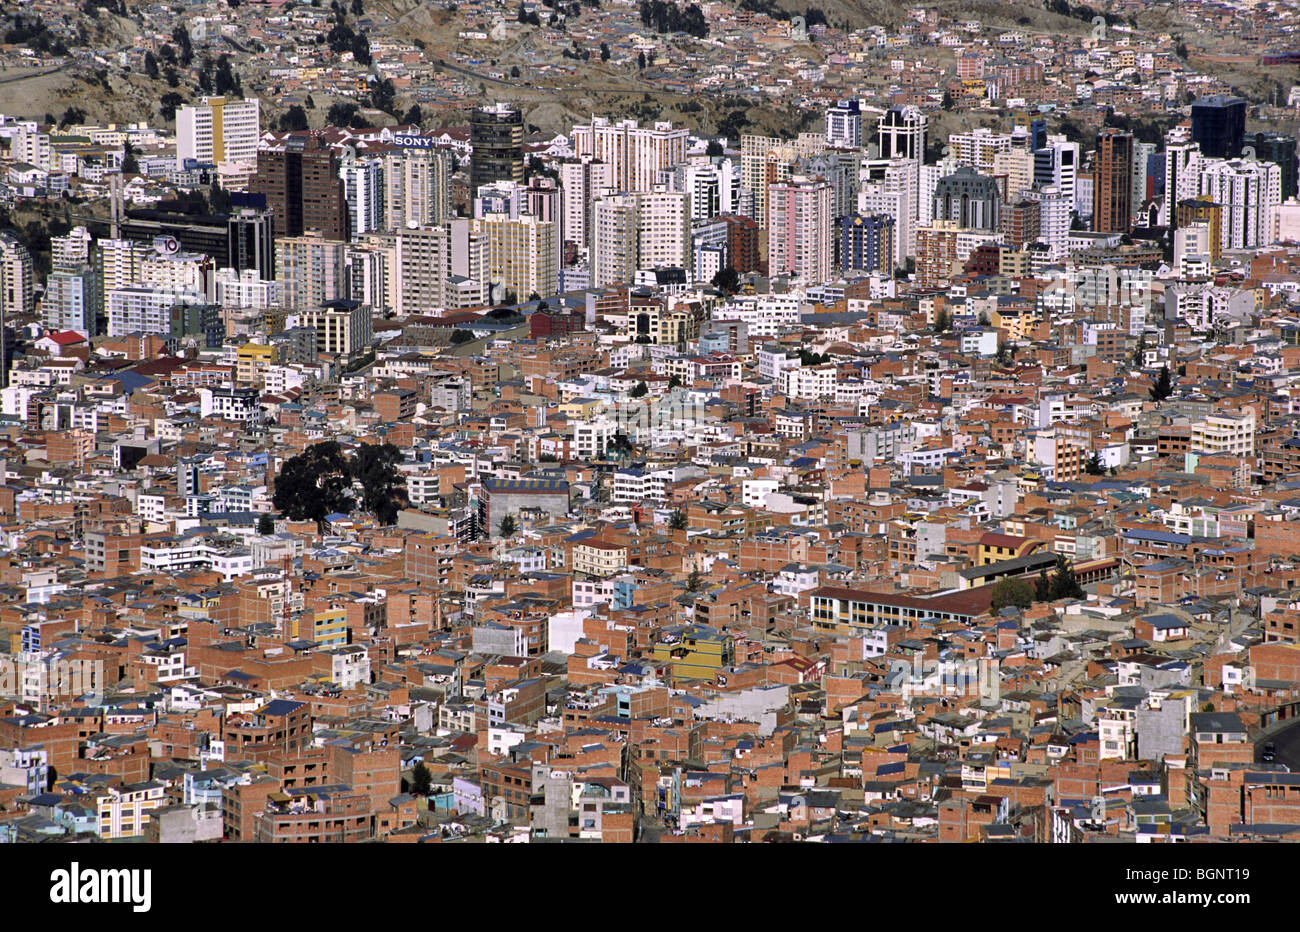 Down town La Paz, capital of Bolivia Stock Photo